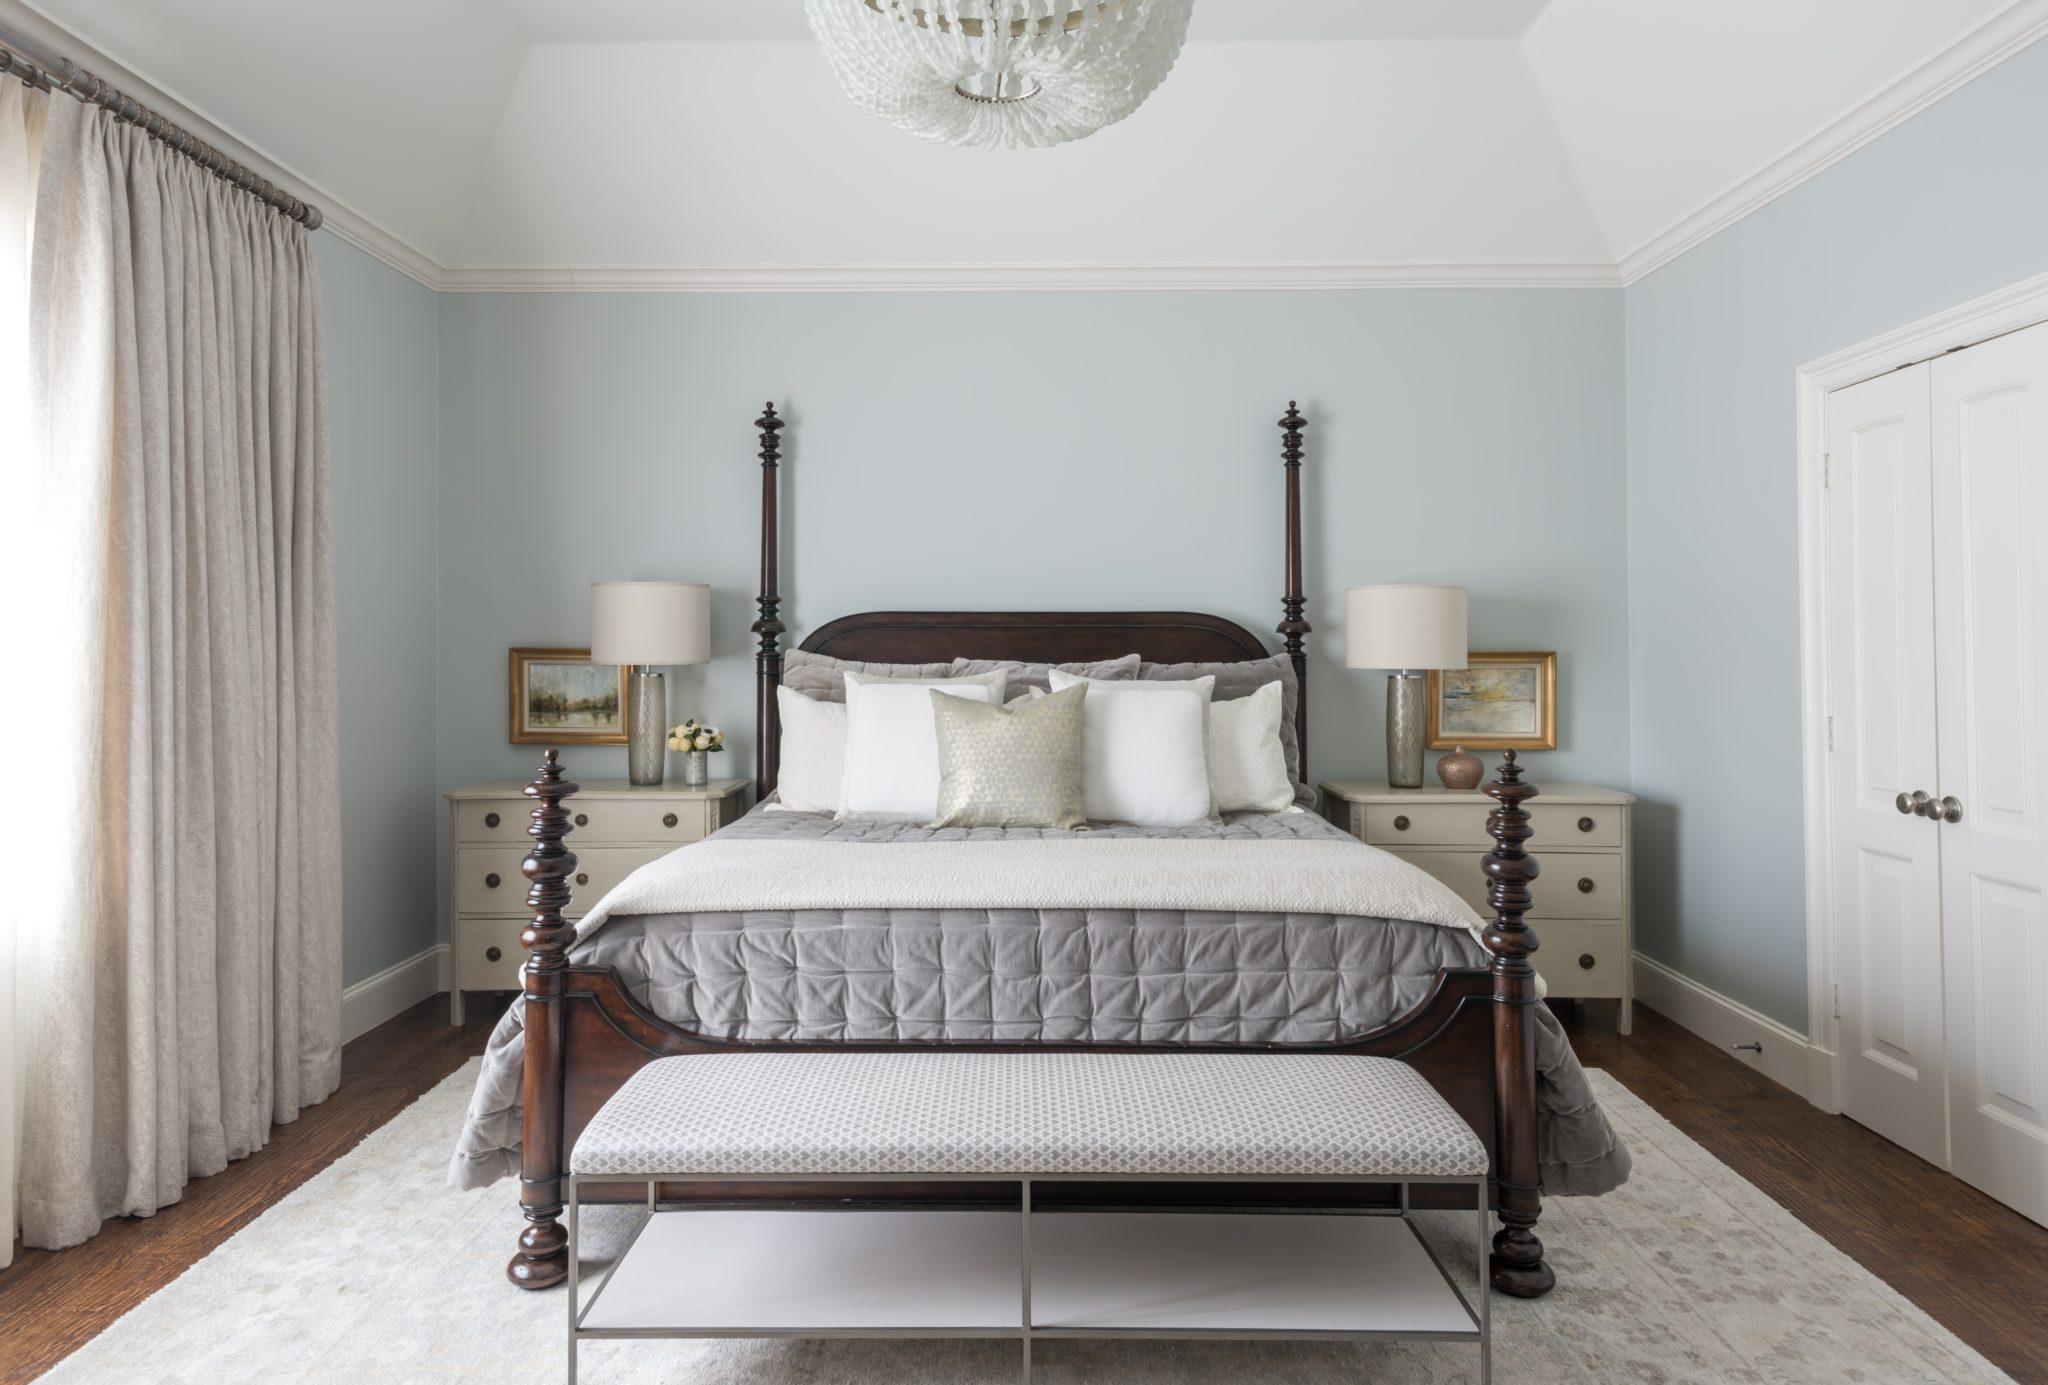 Stanford Avenue - Master Bedroom by Allison Seidler Interiors